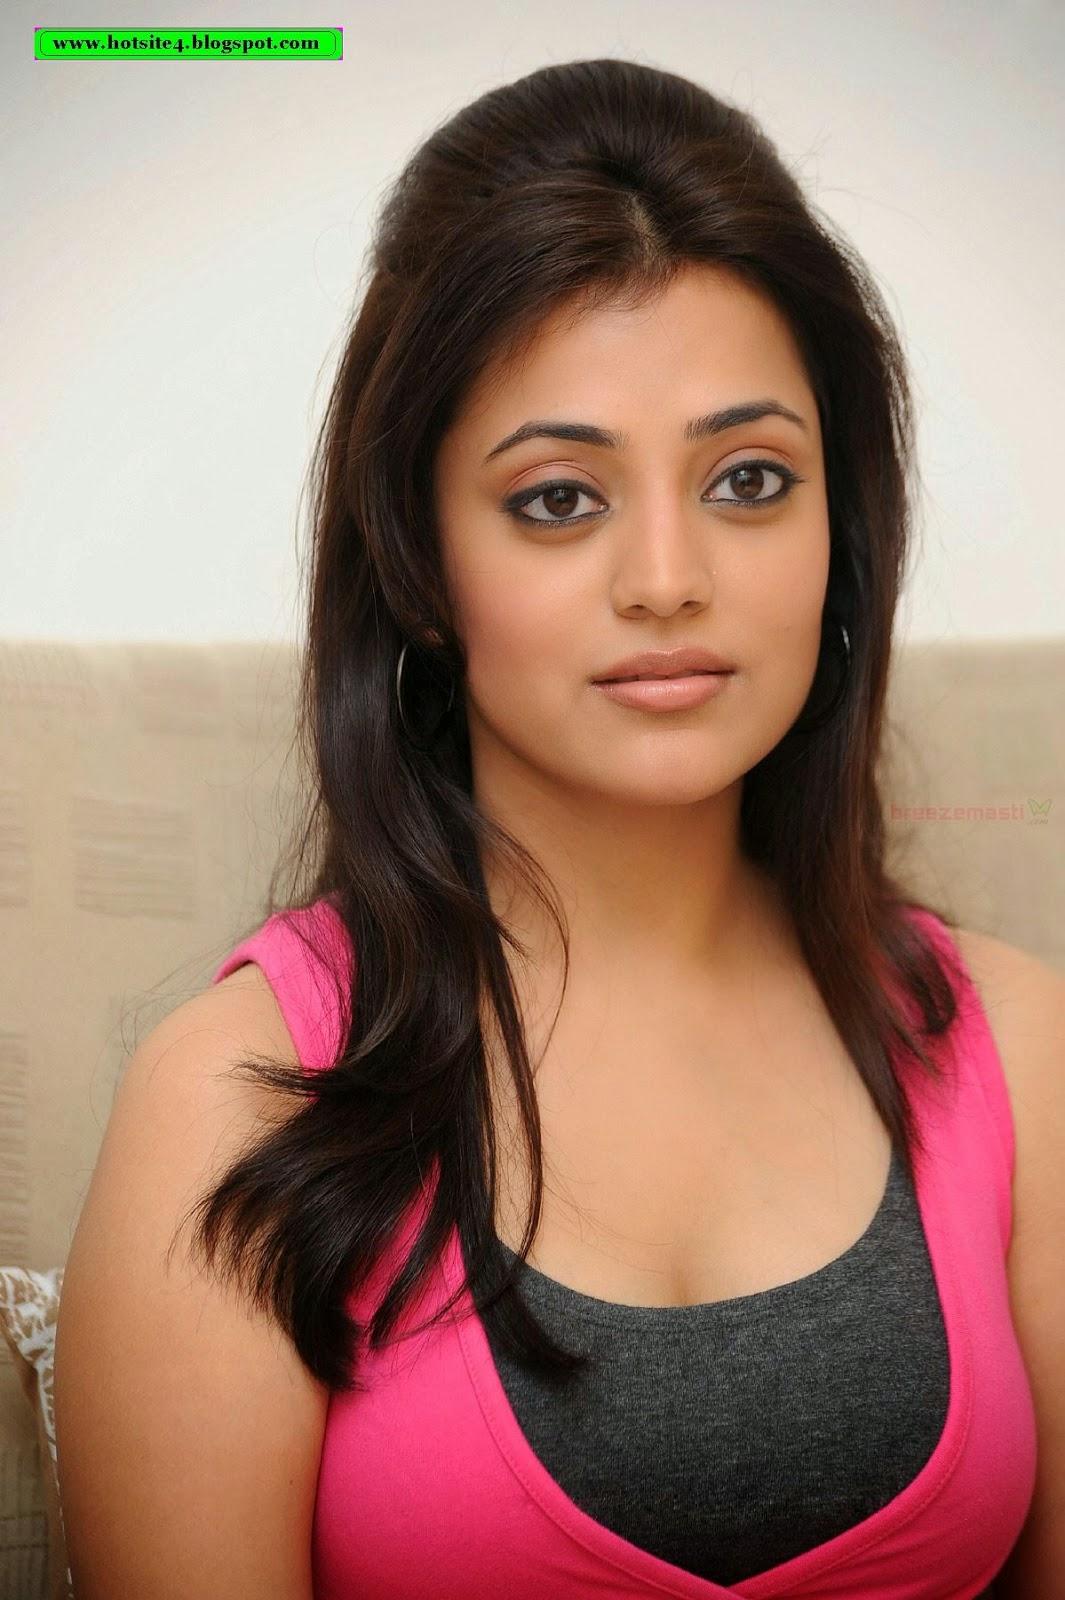 Tamil actress hot hd wallpaper 2013